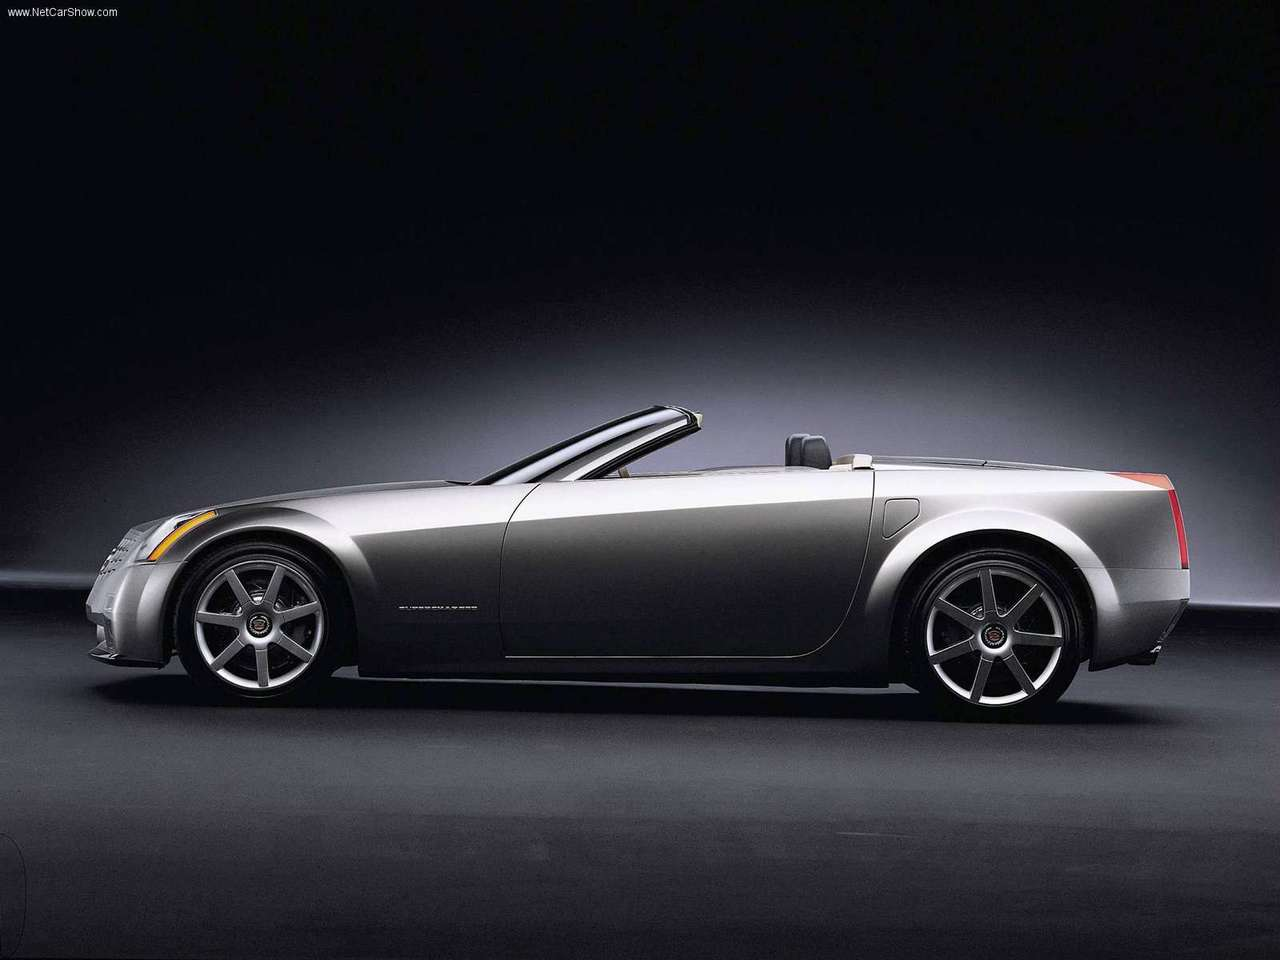 1999_Cadillac_Evoq_Concept_1280x960_02.jpg